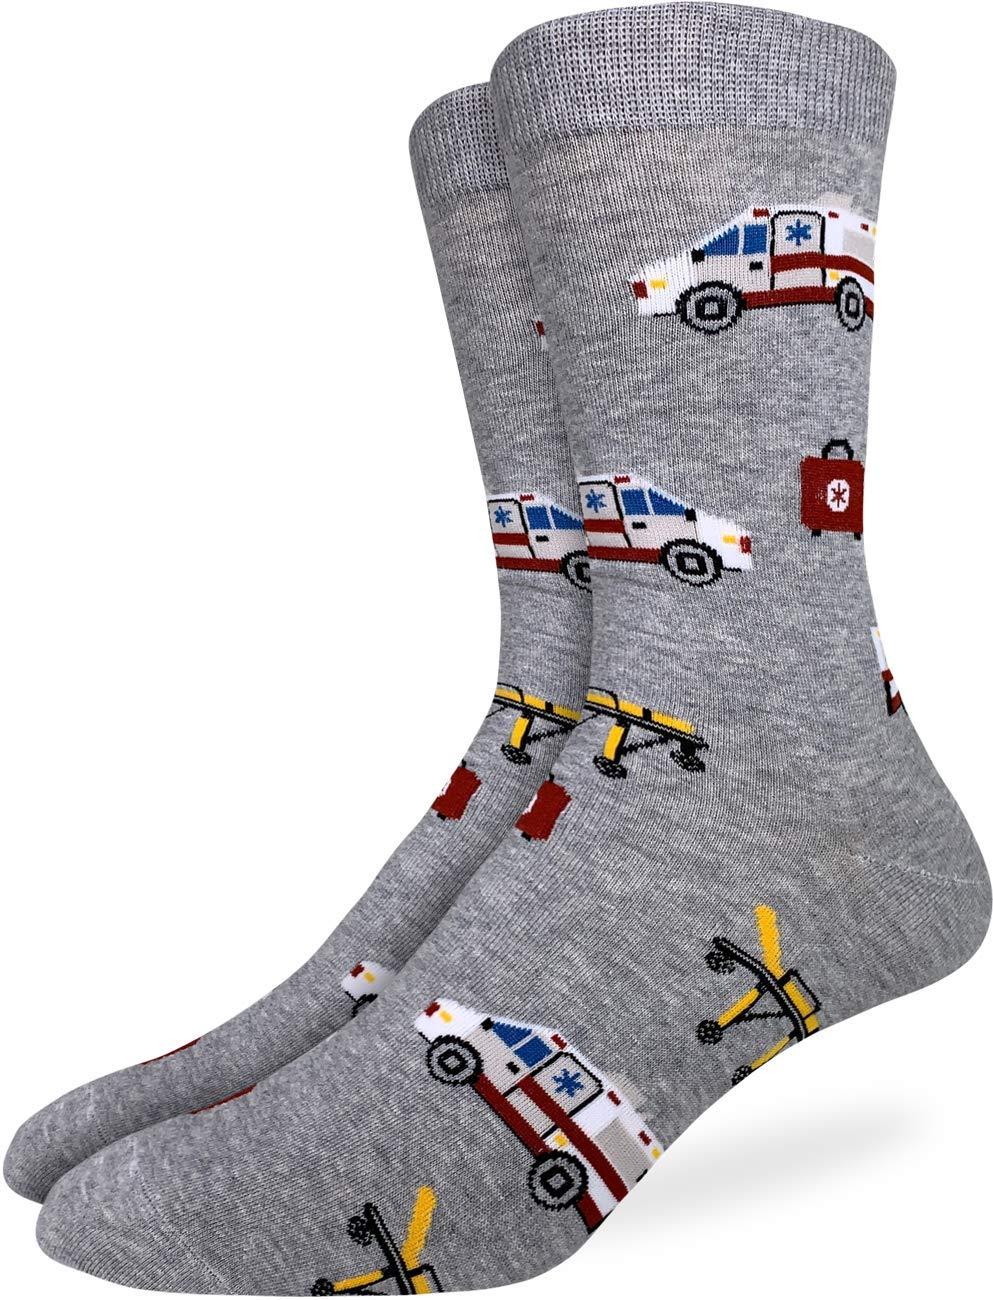 Good Luck Sock Men's Paramedic Socks - Grey, Adult Shoe Size 7-12